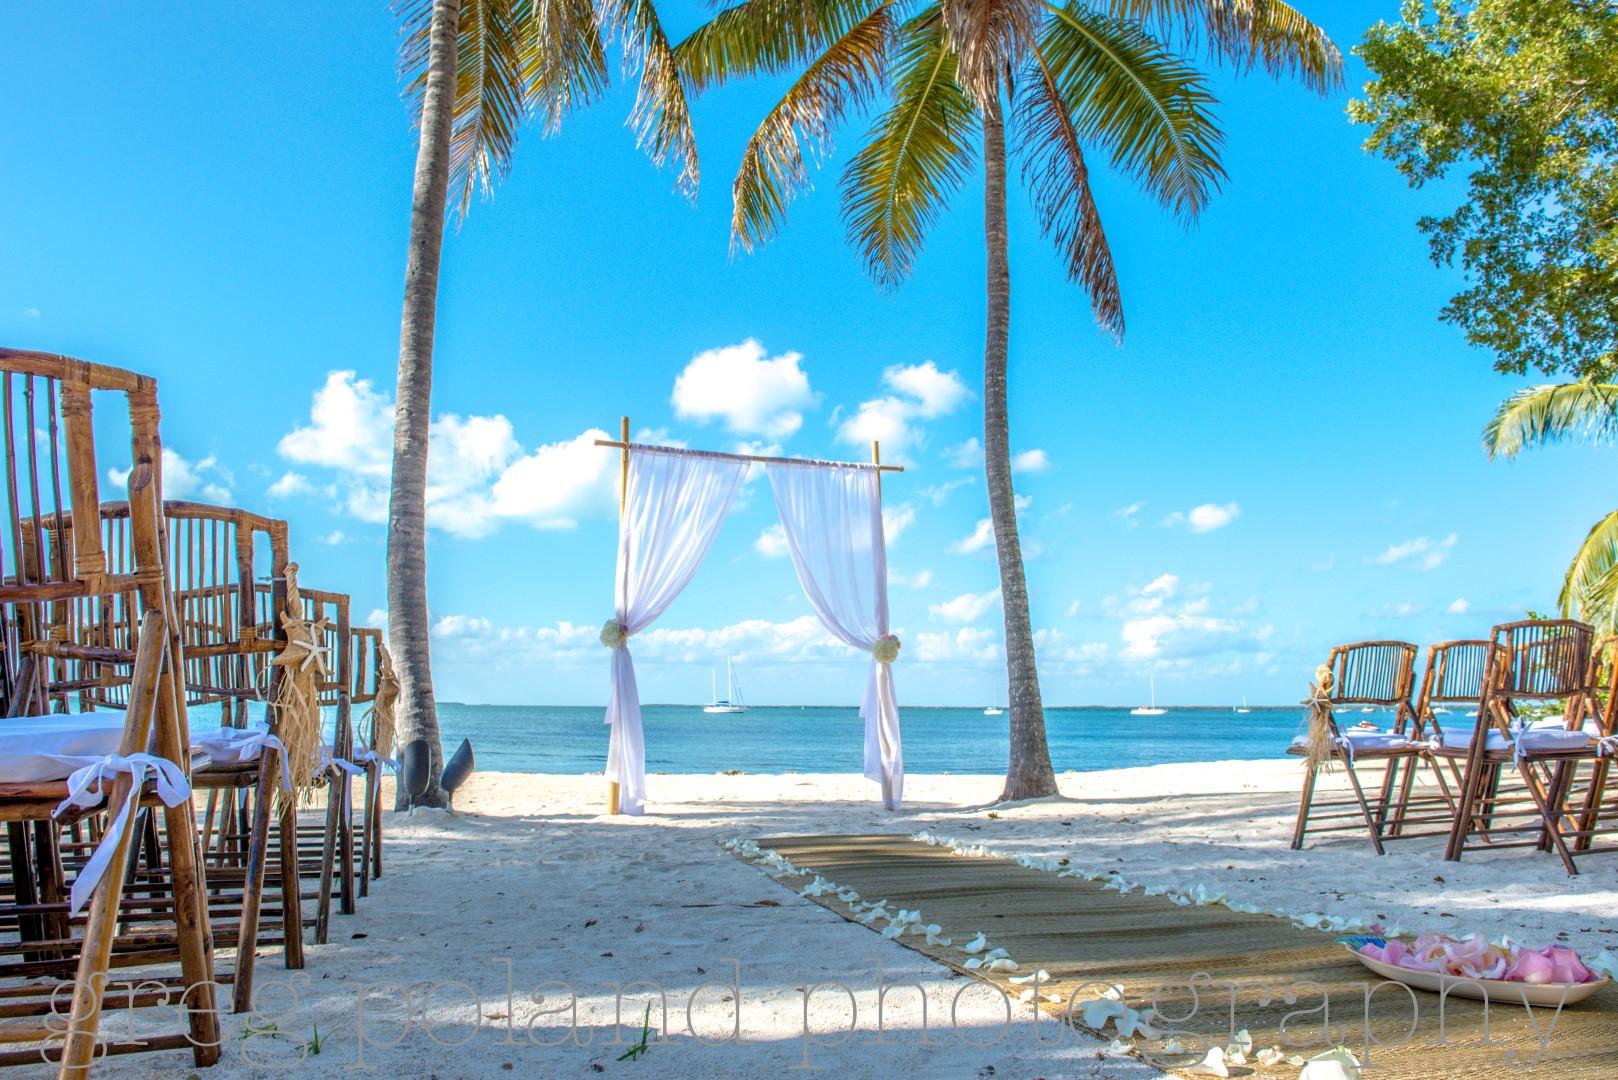 Key Largo Lighthouse Beach Weddings Wedding Venue In South Florida Partyspace